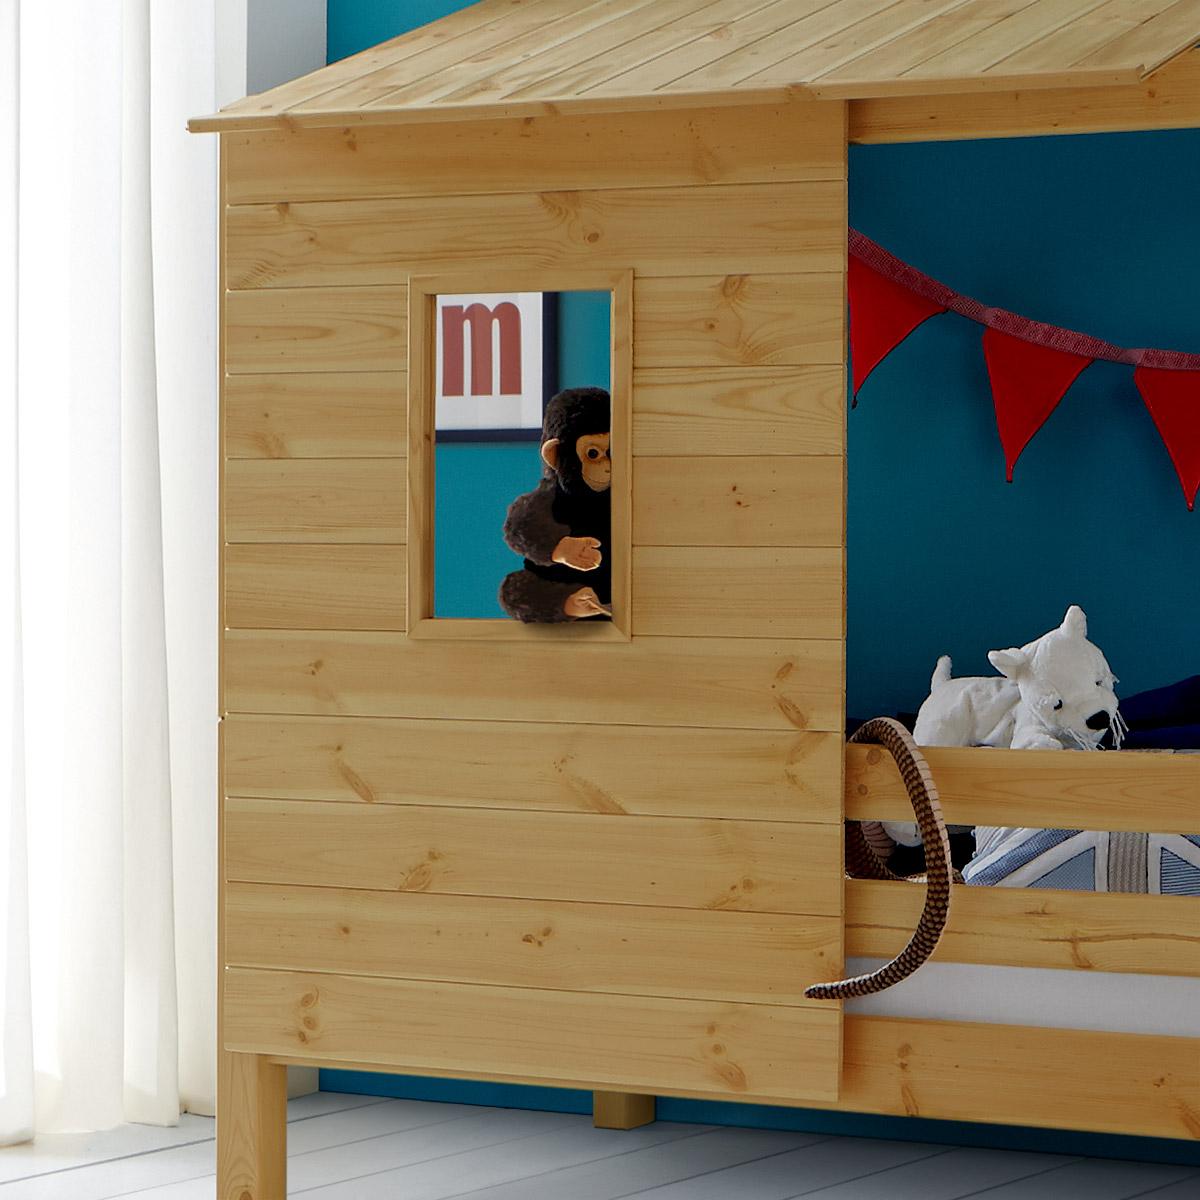 Kinderbett spielhaus  Abenteuerbett mit Spielhaus aus Holz - Kids Paradise